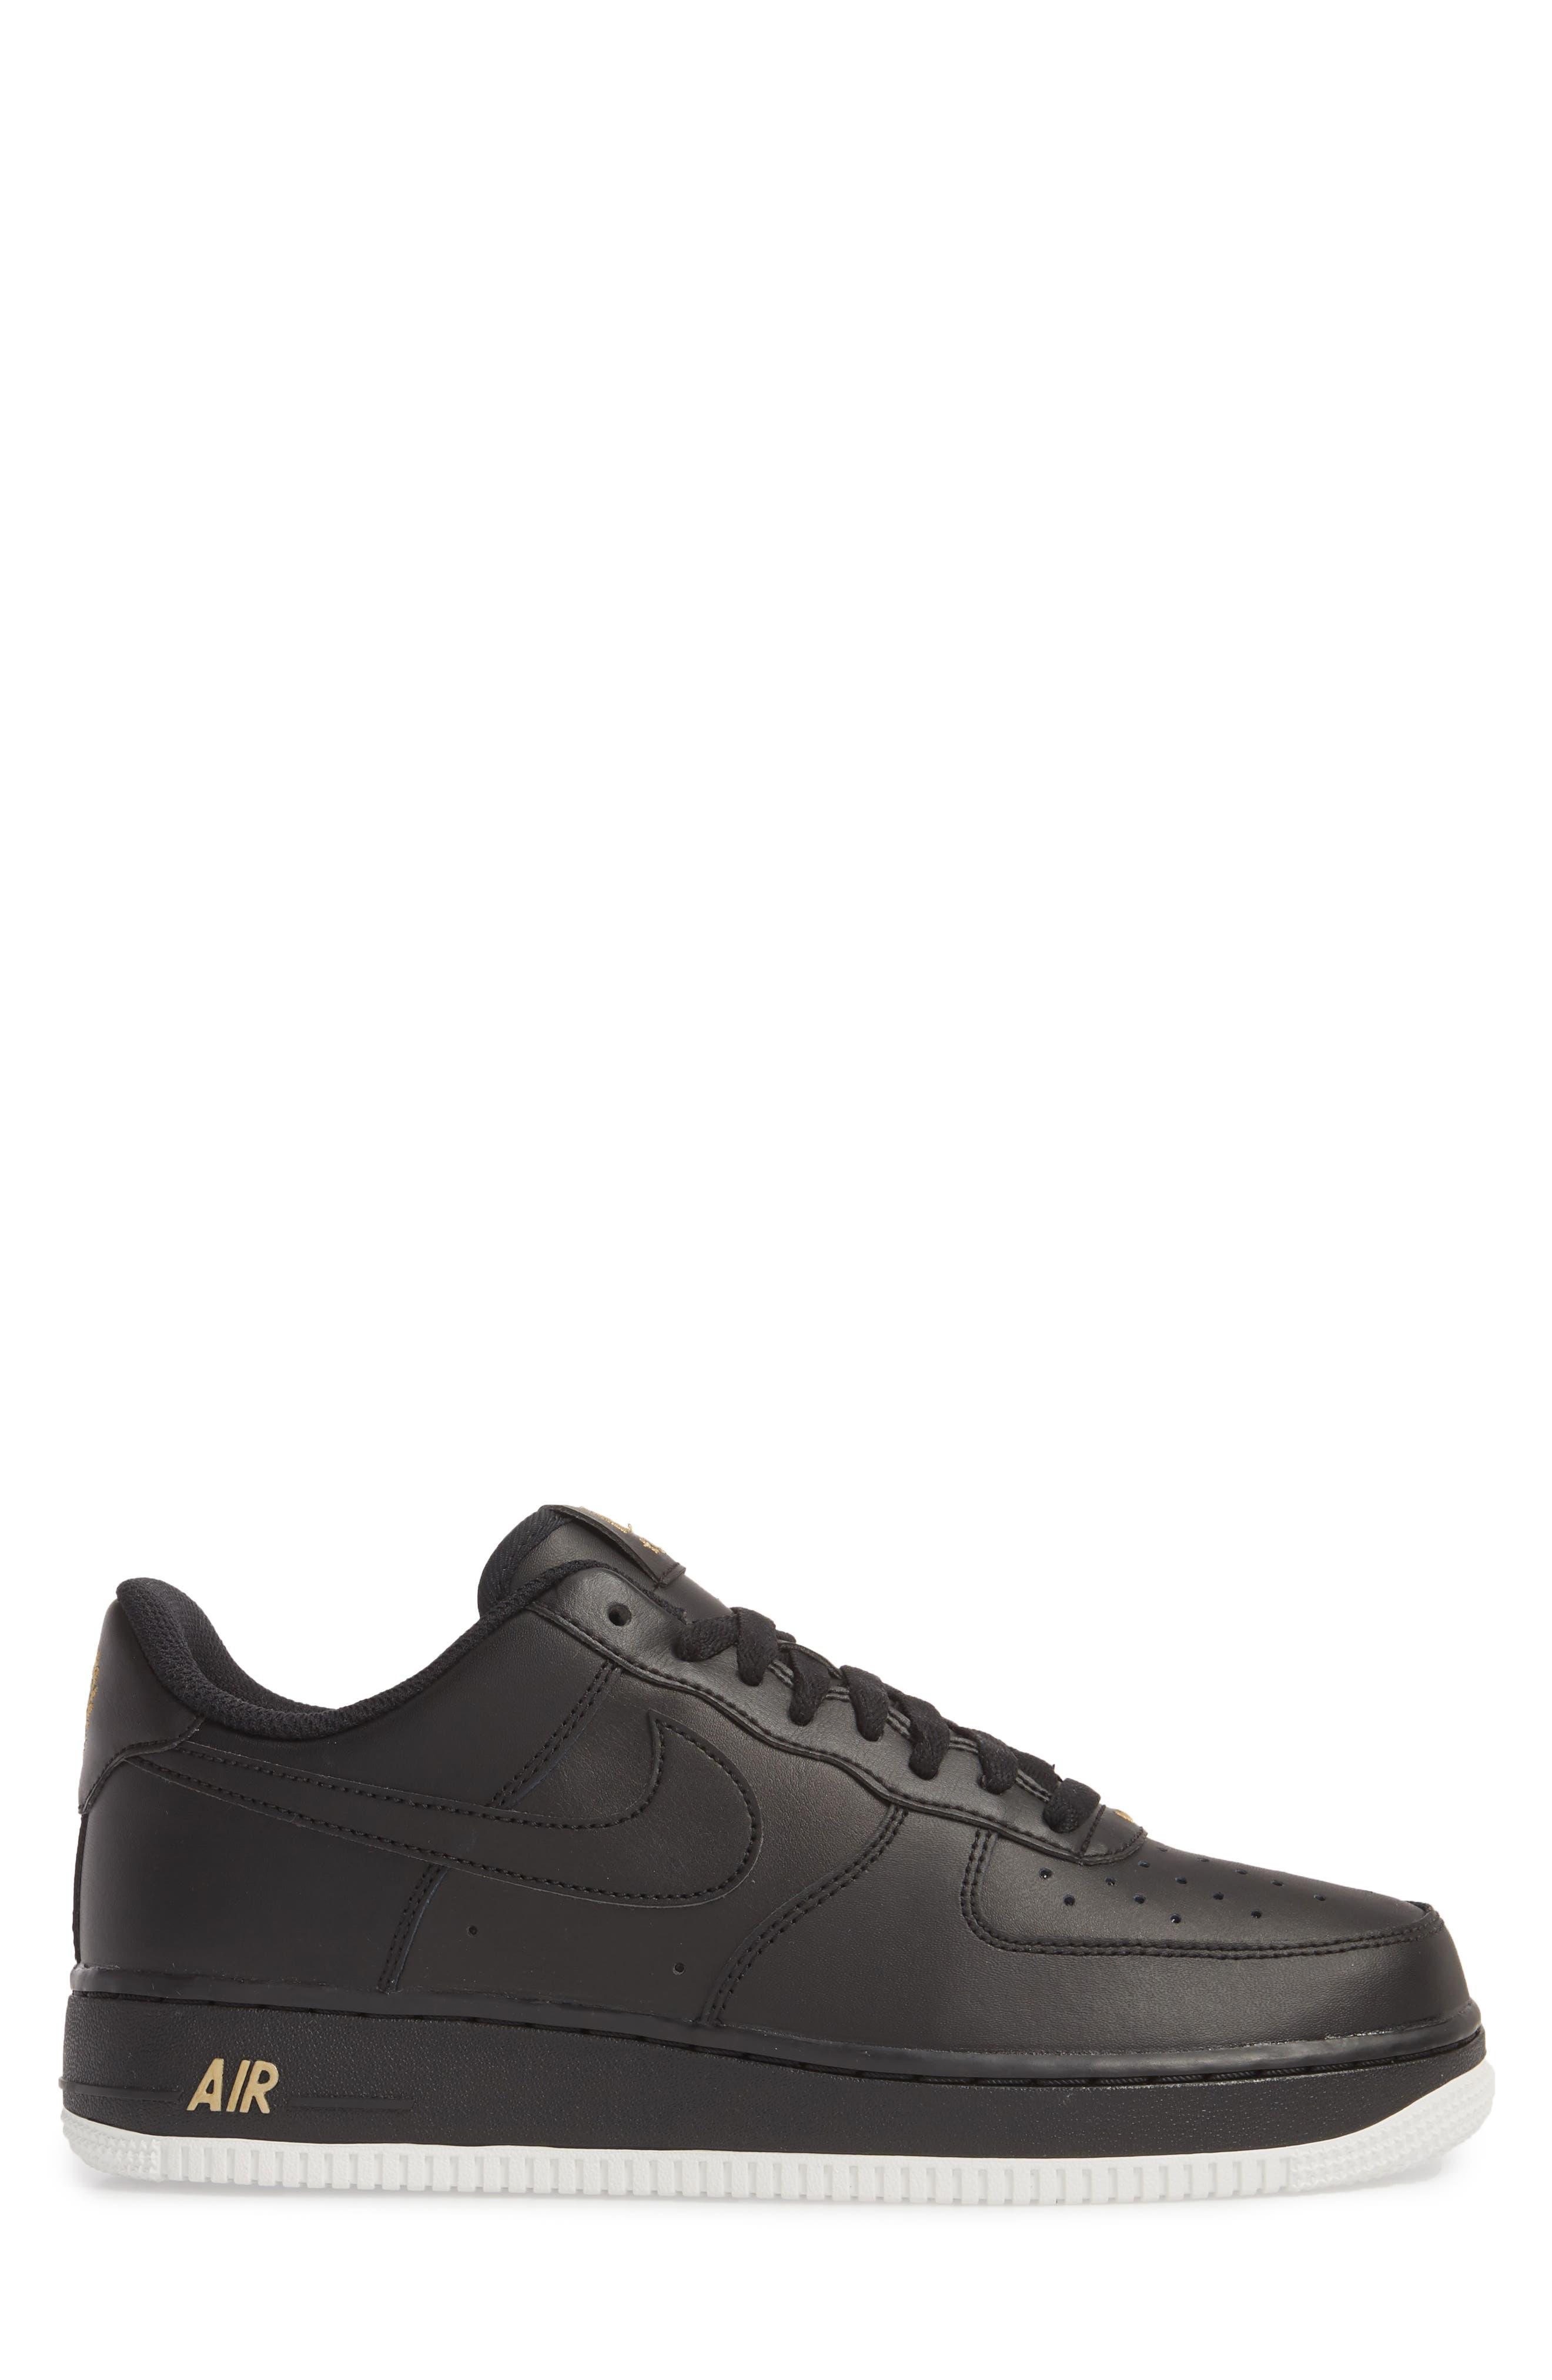 Air Force 1 07 Sneaker,                             Alternate thumbnail 3, color,                             014